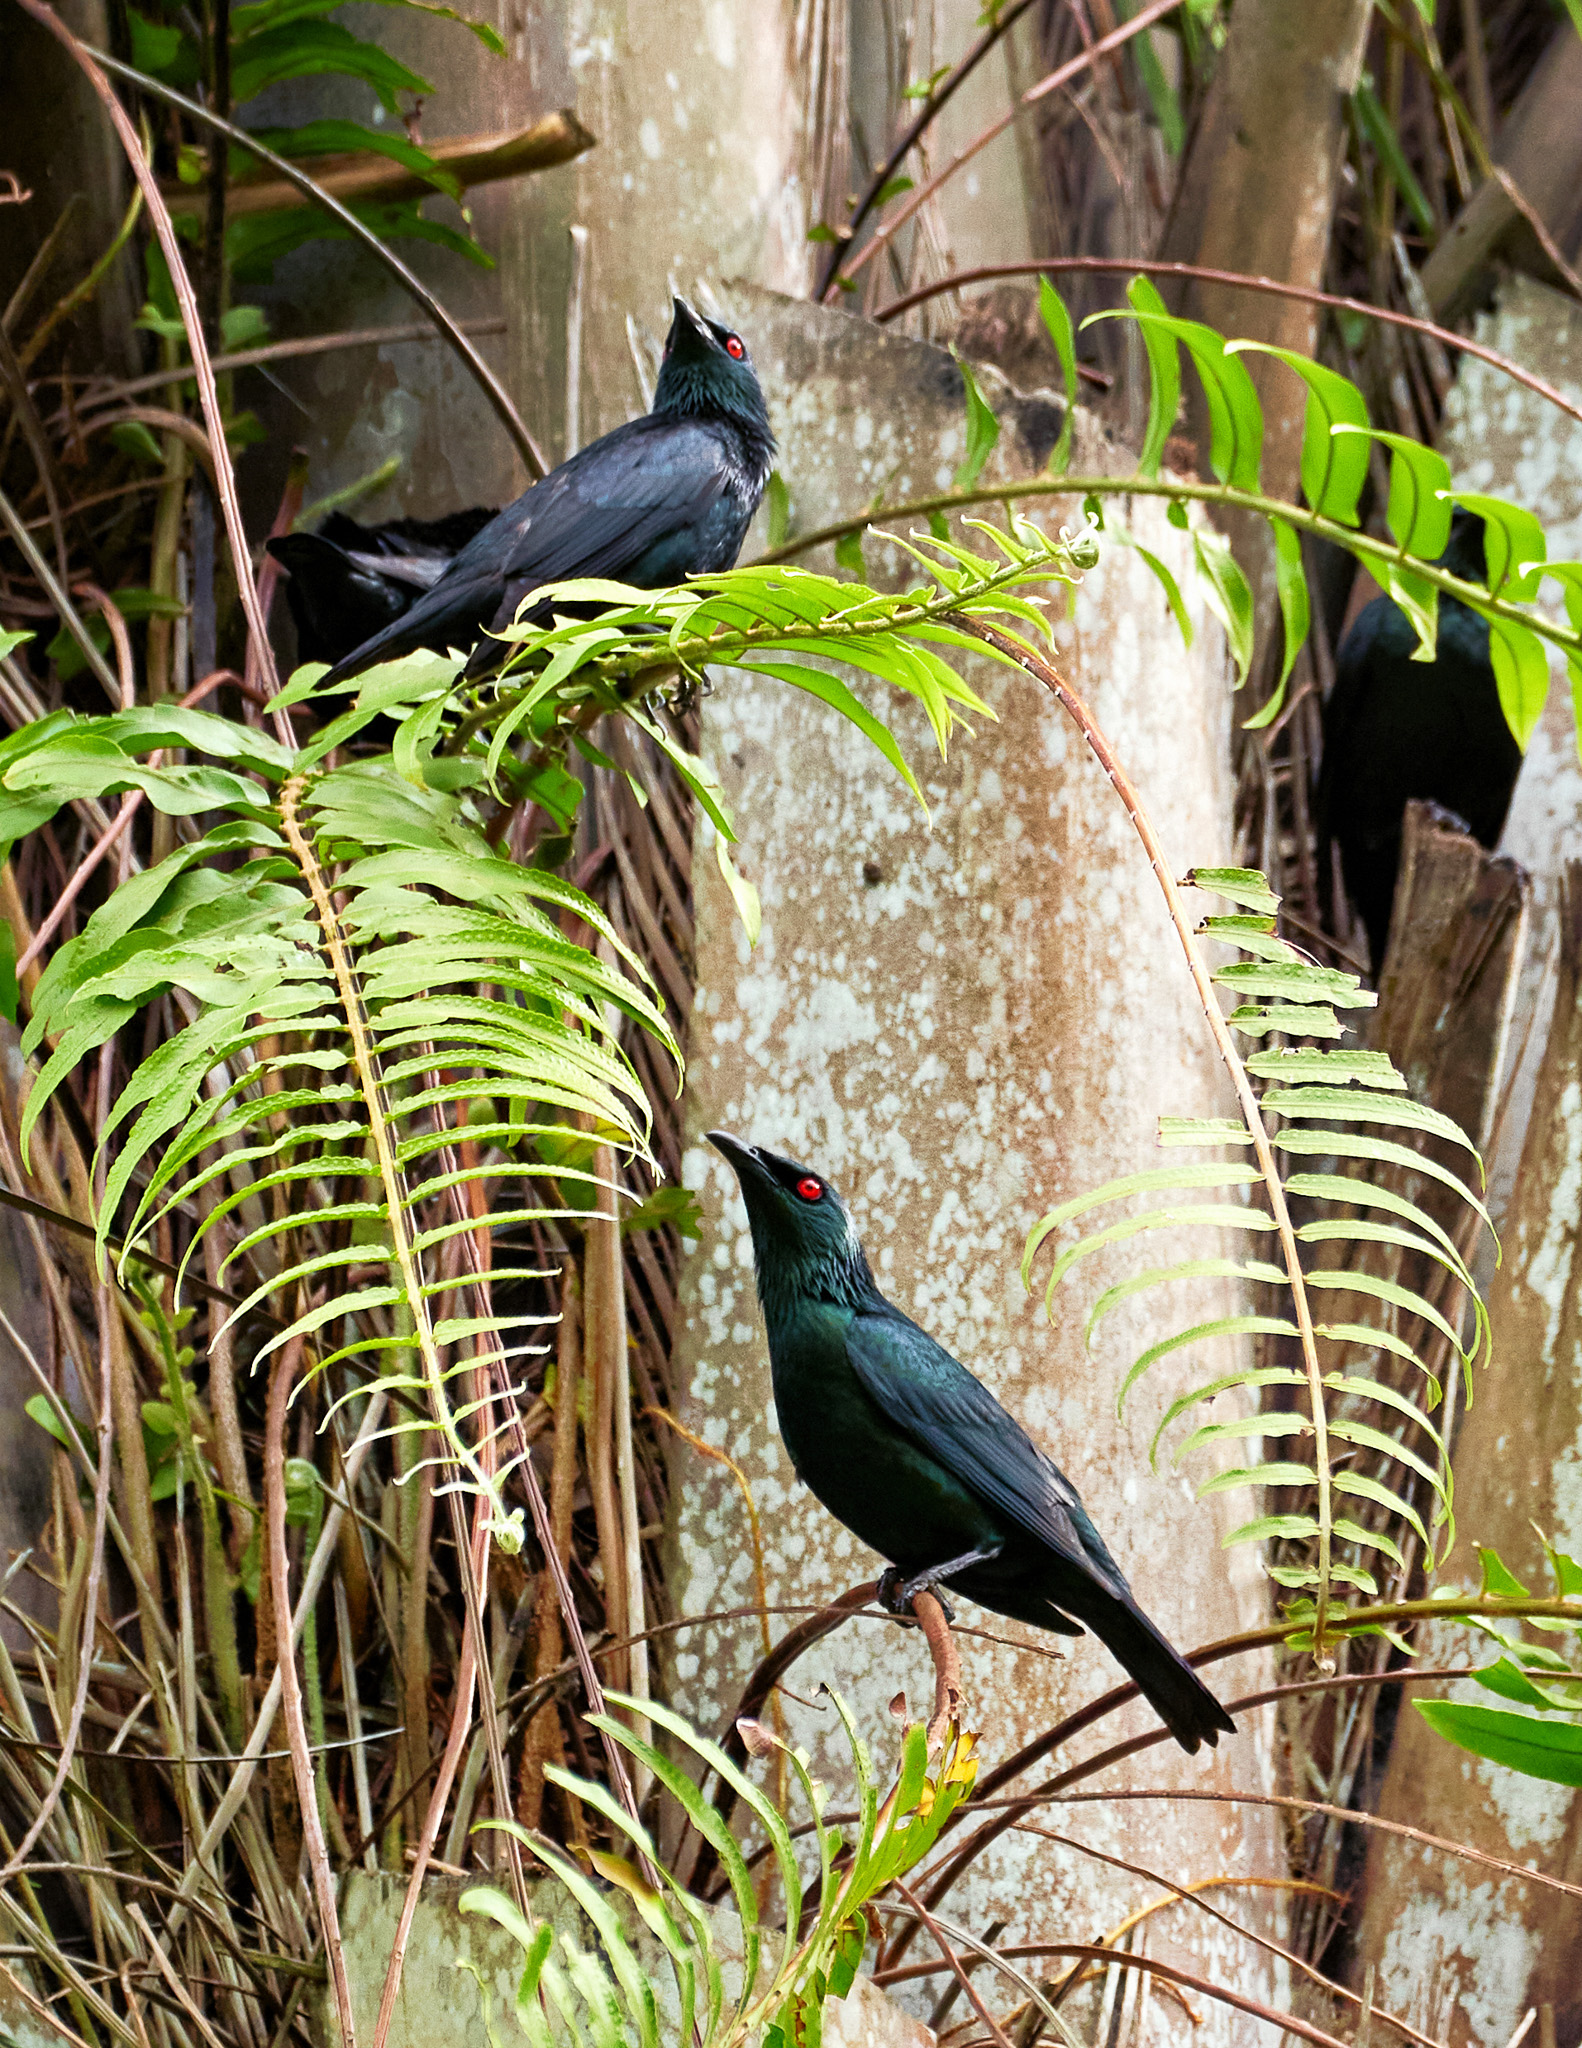 Asian glossy starling birds gathered in a flock, Singapore Botanic Gardens, Singapore